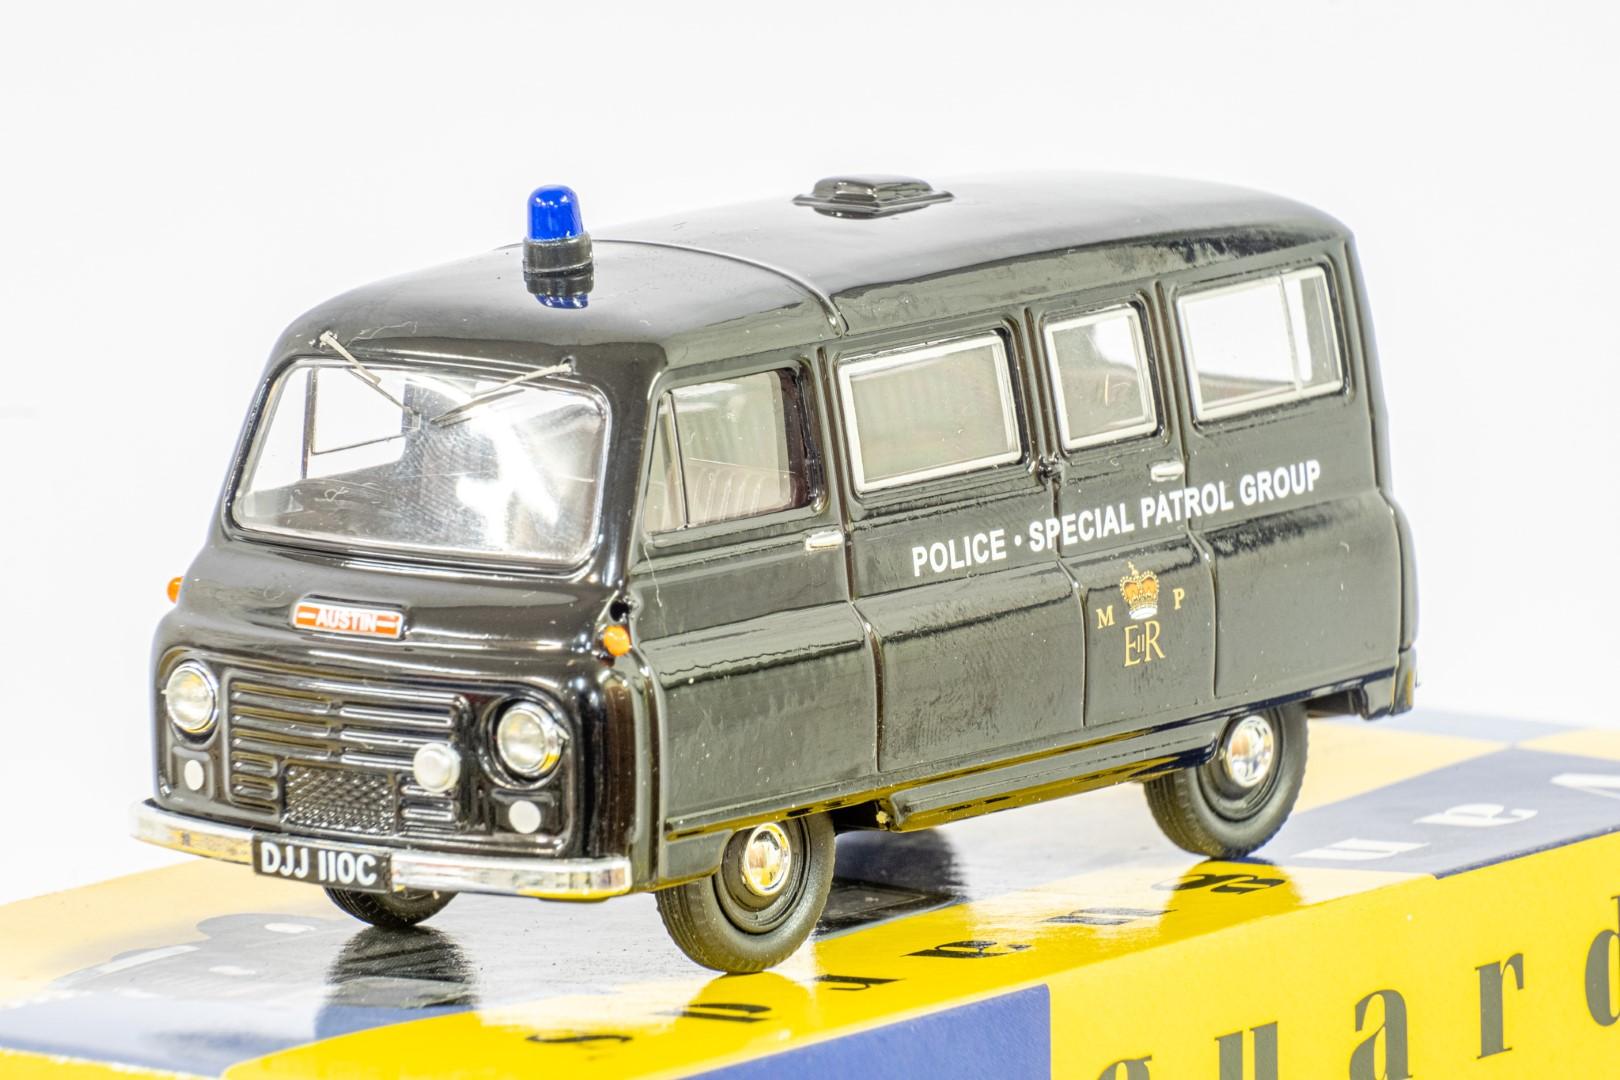 Vanguards Morris J2 Minibus - Metropolitan Police SPG - Image 5 of 6